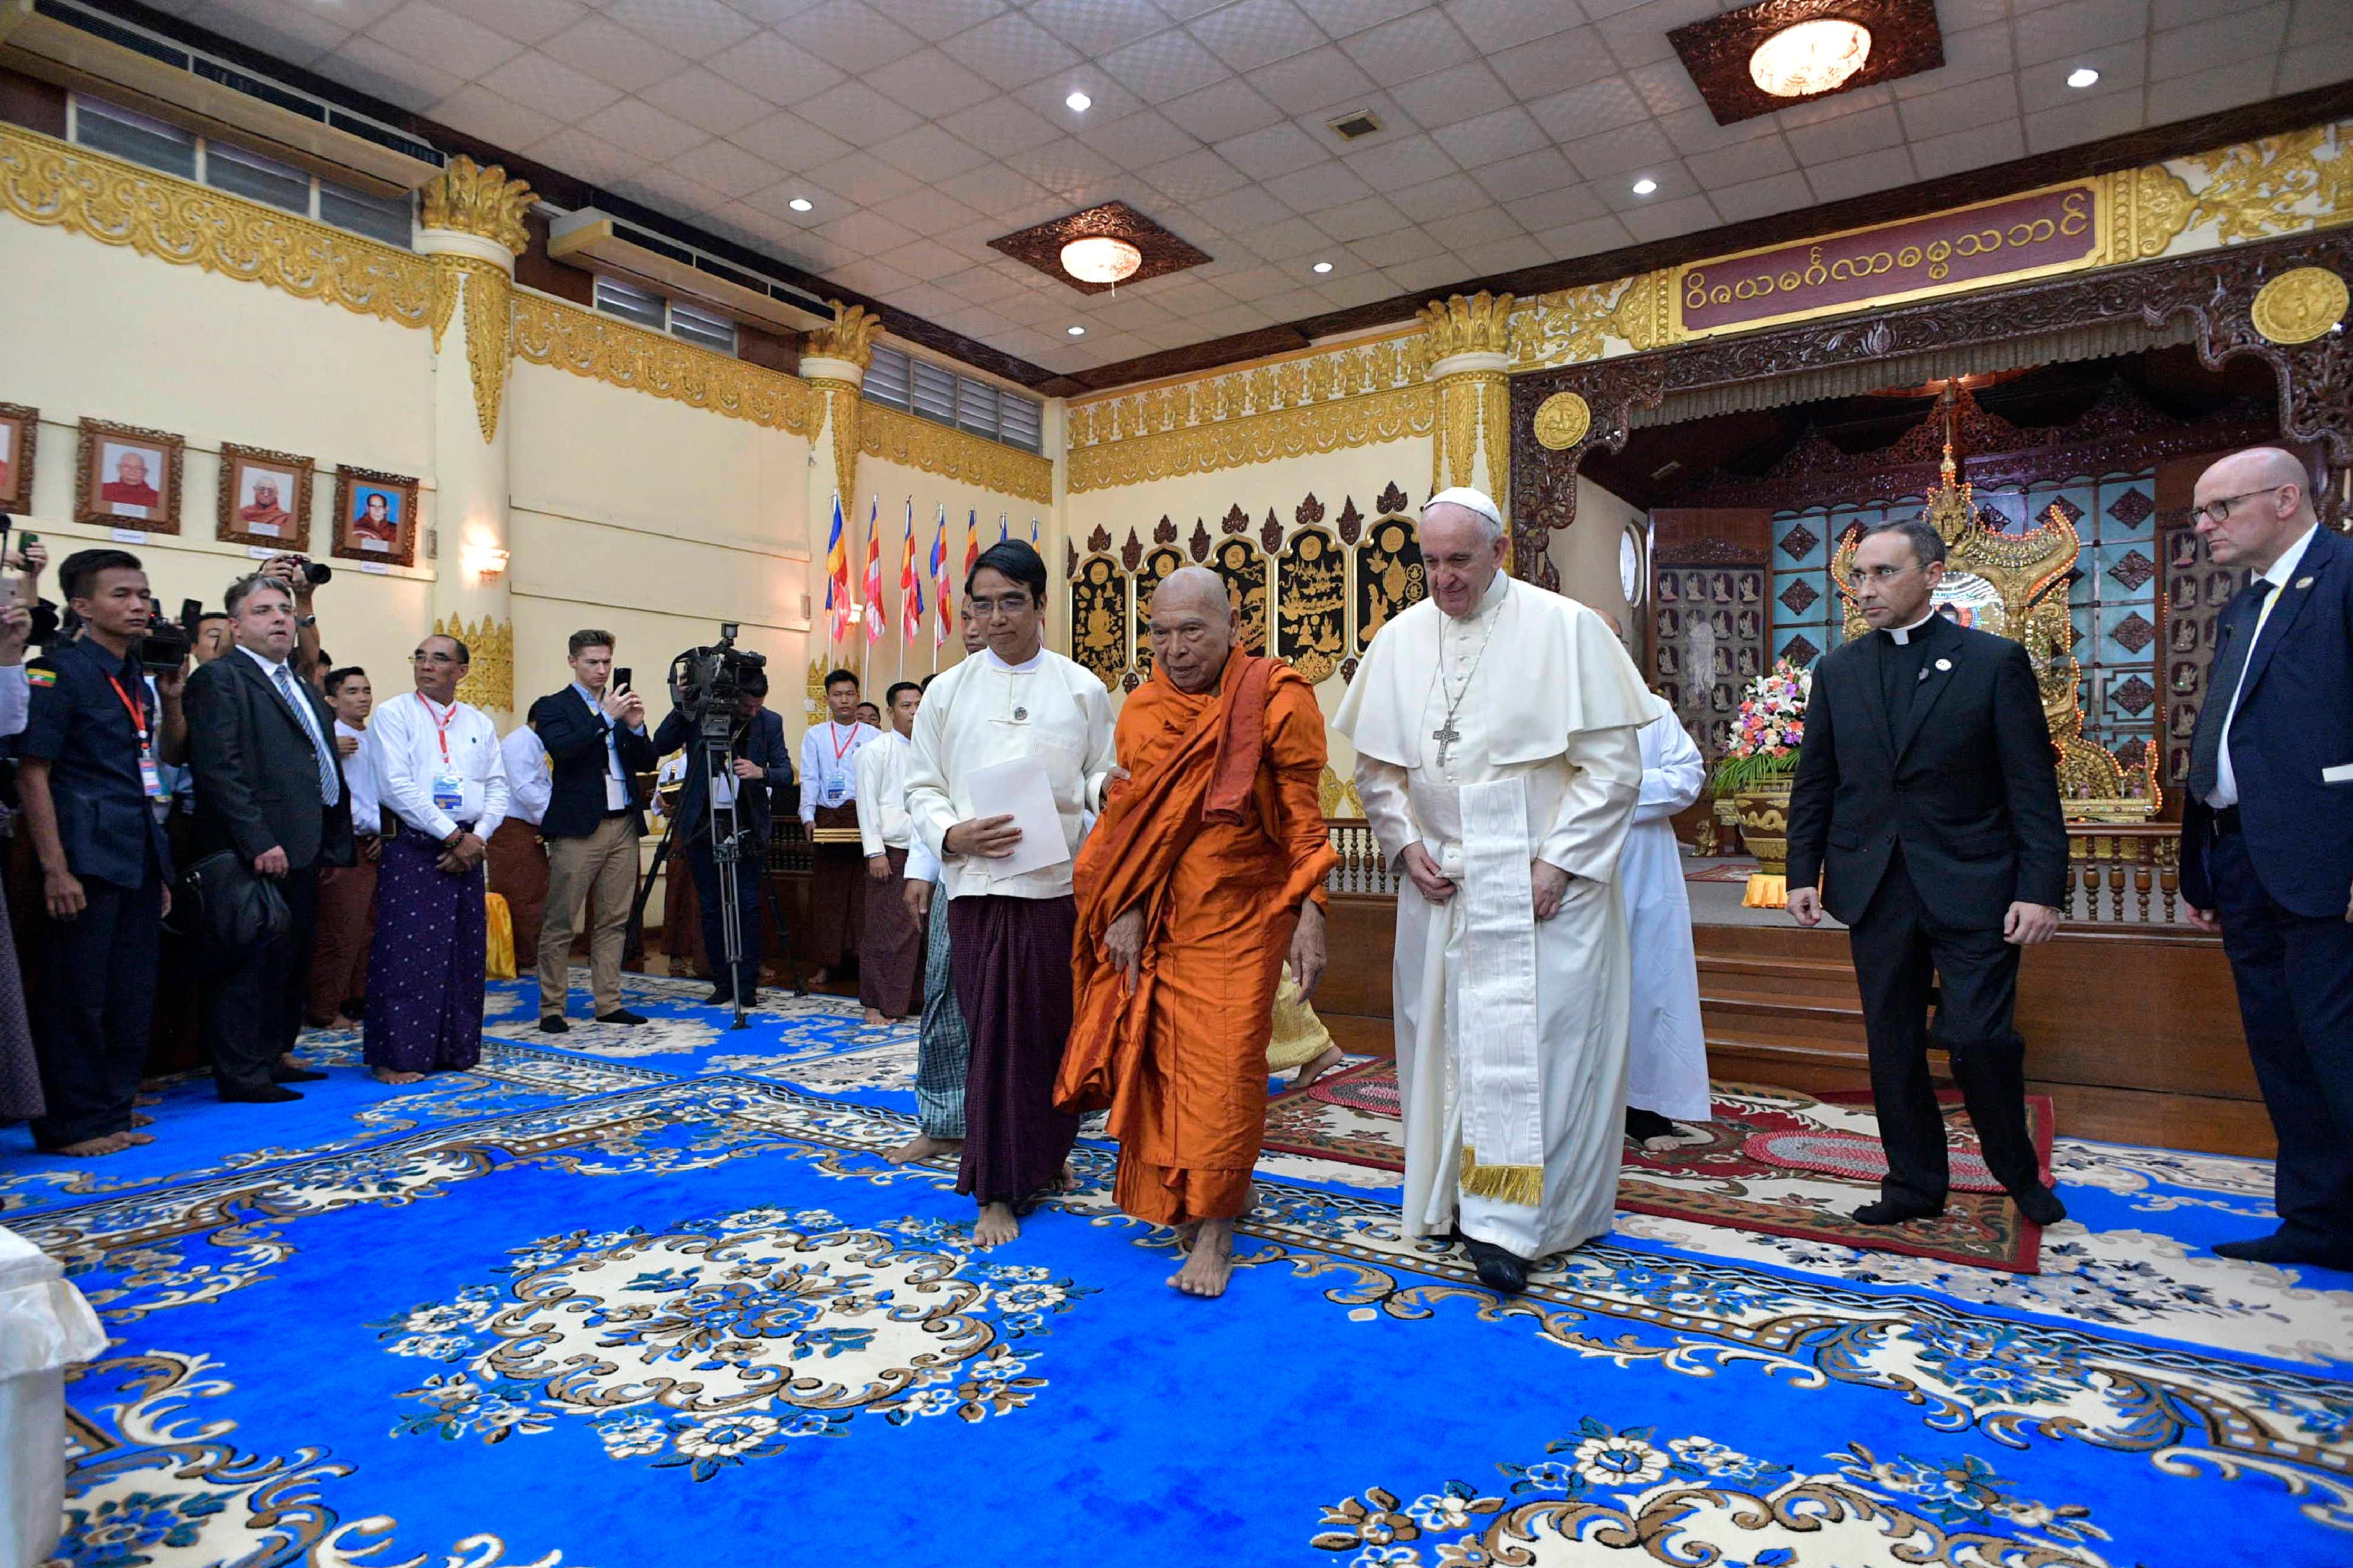 El Presidente del Consejo Supremo 'Sangha' de monjes budista ha recibido al Papa © L'Osservatore Romano